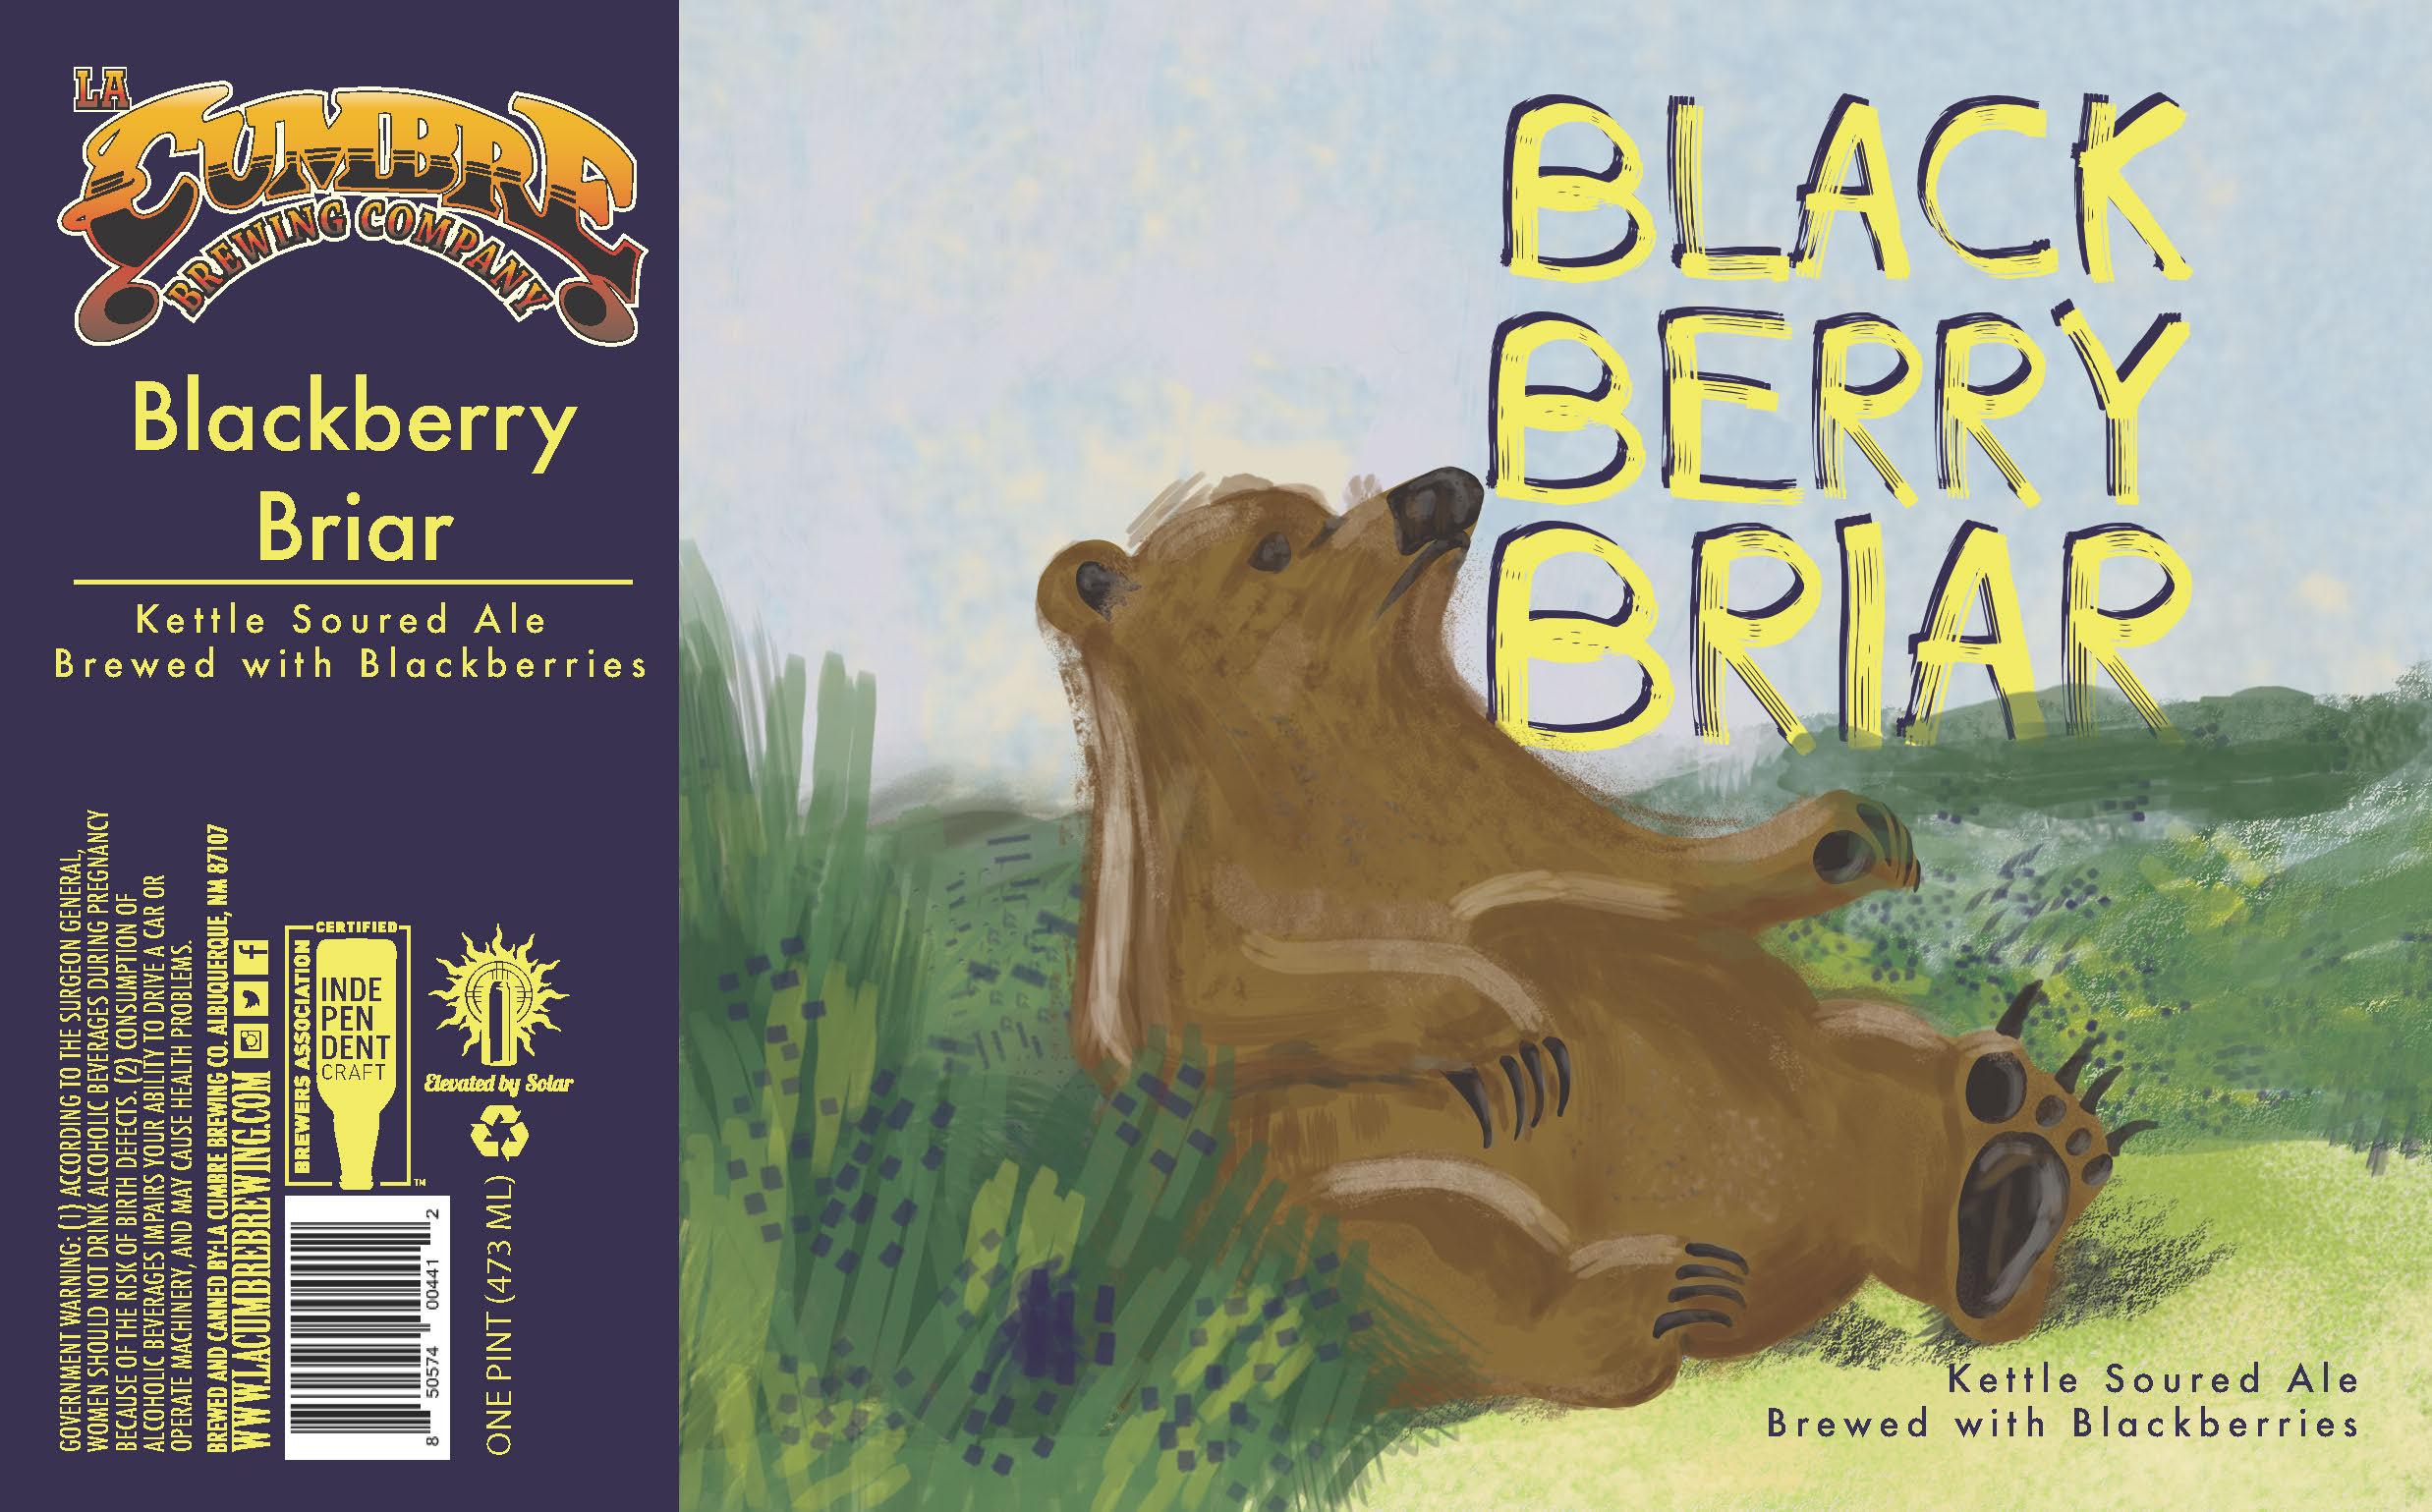 blackberry briar label